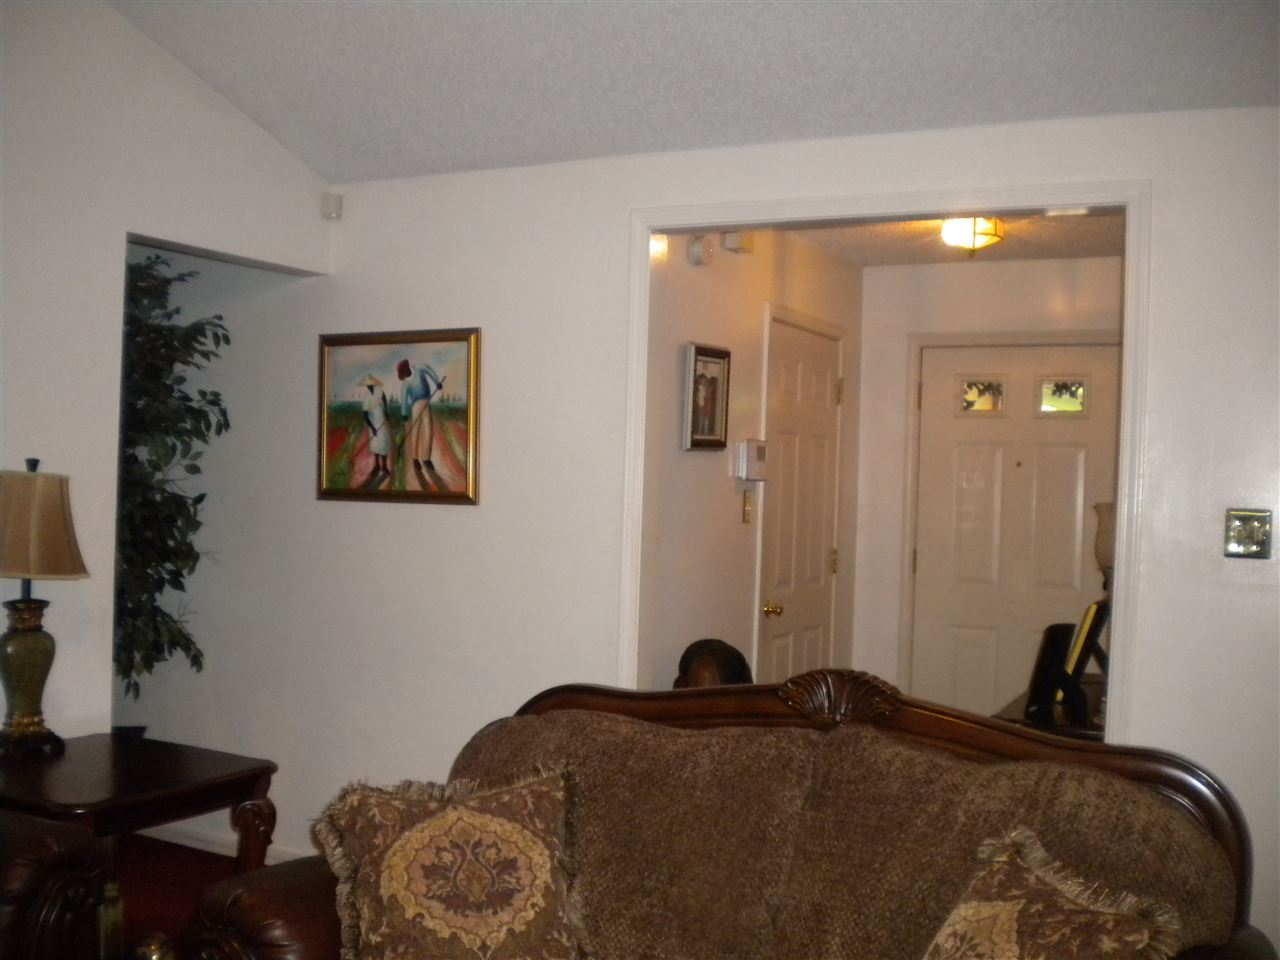 5953 Wedgewood Memphis, TN 38141 - MLS #: 10013094